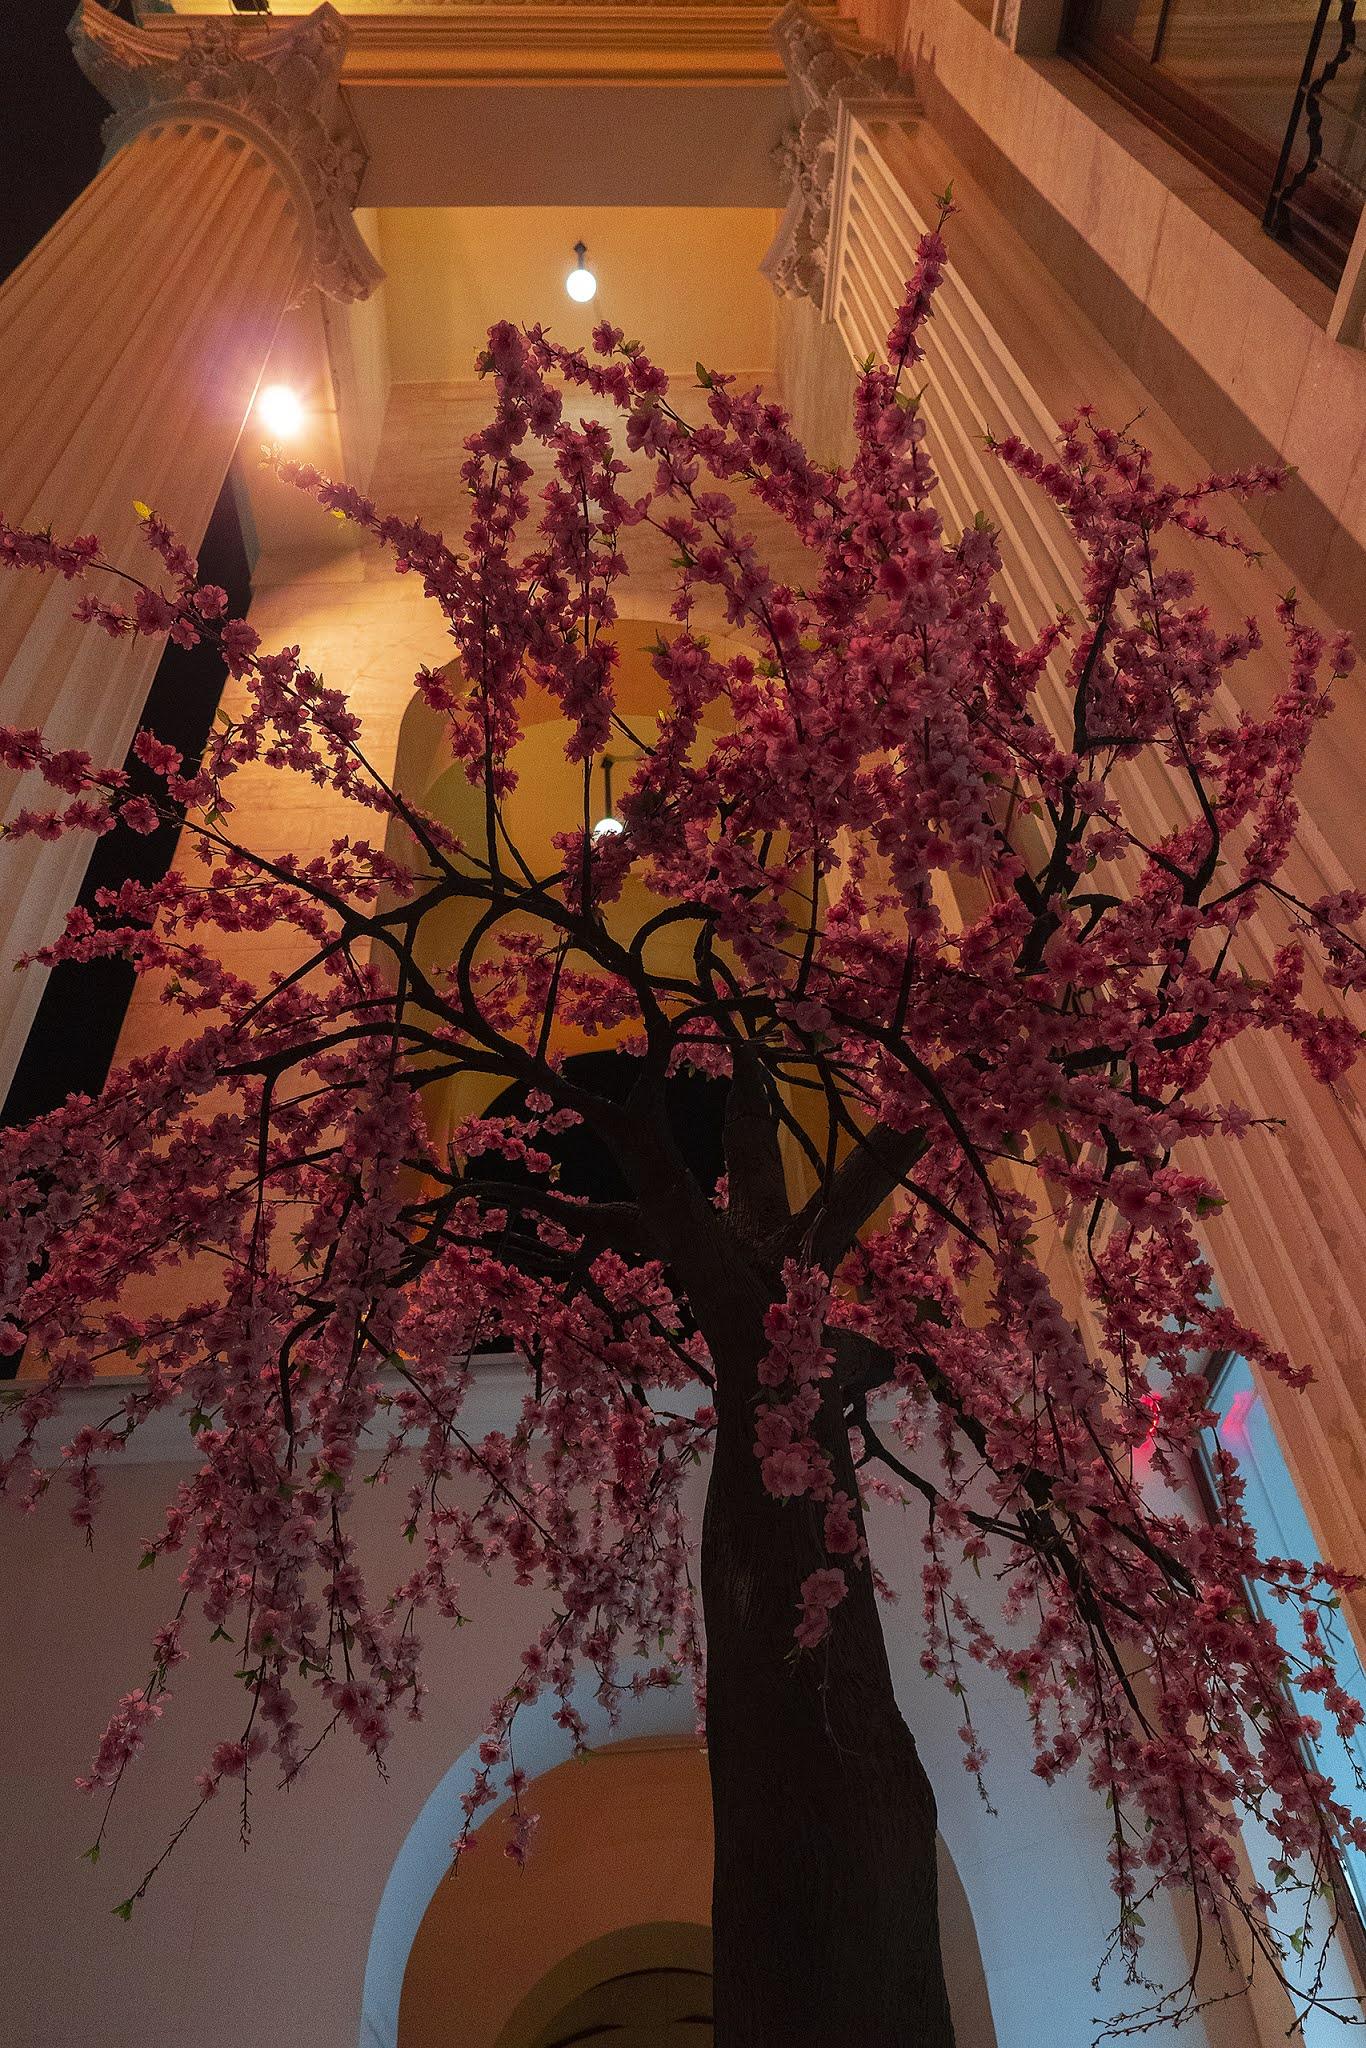 photo Igor Novik Sochi night night city sakura columns tree scenery south